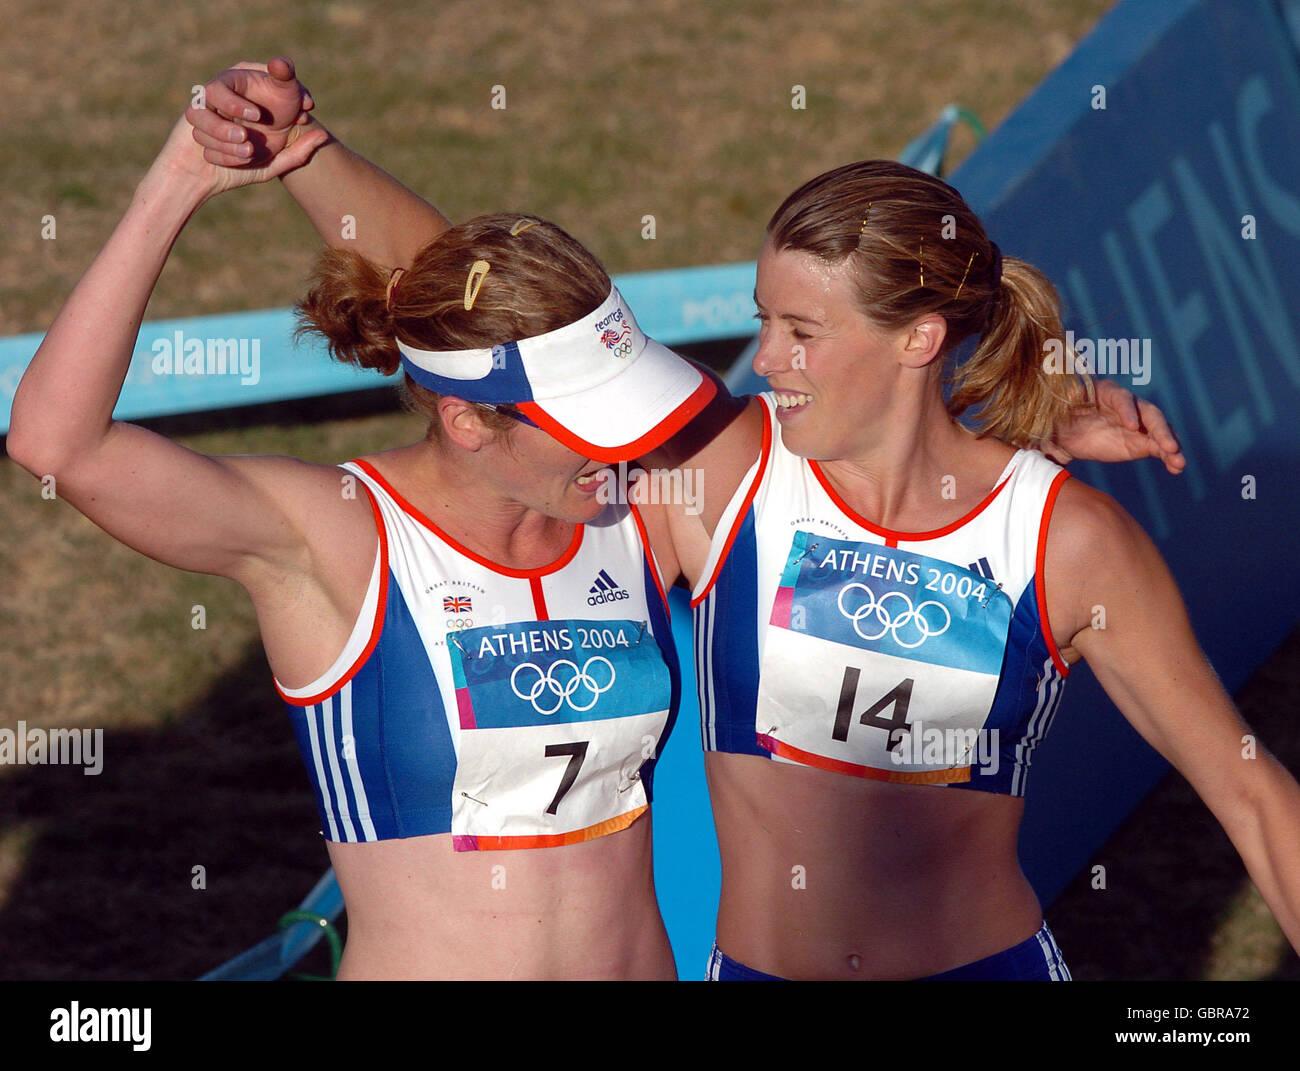 Modern Pentathlon - Athens Olympic Games 2004 - Womens Modern Pentathlon - Stock Image